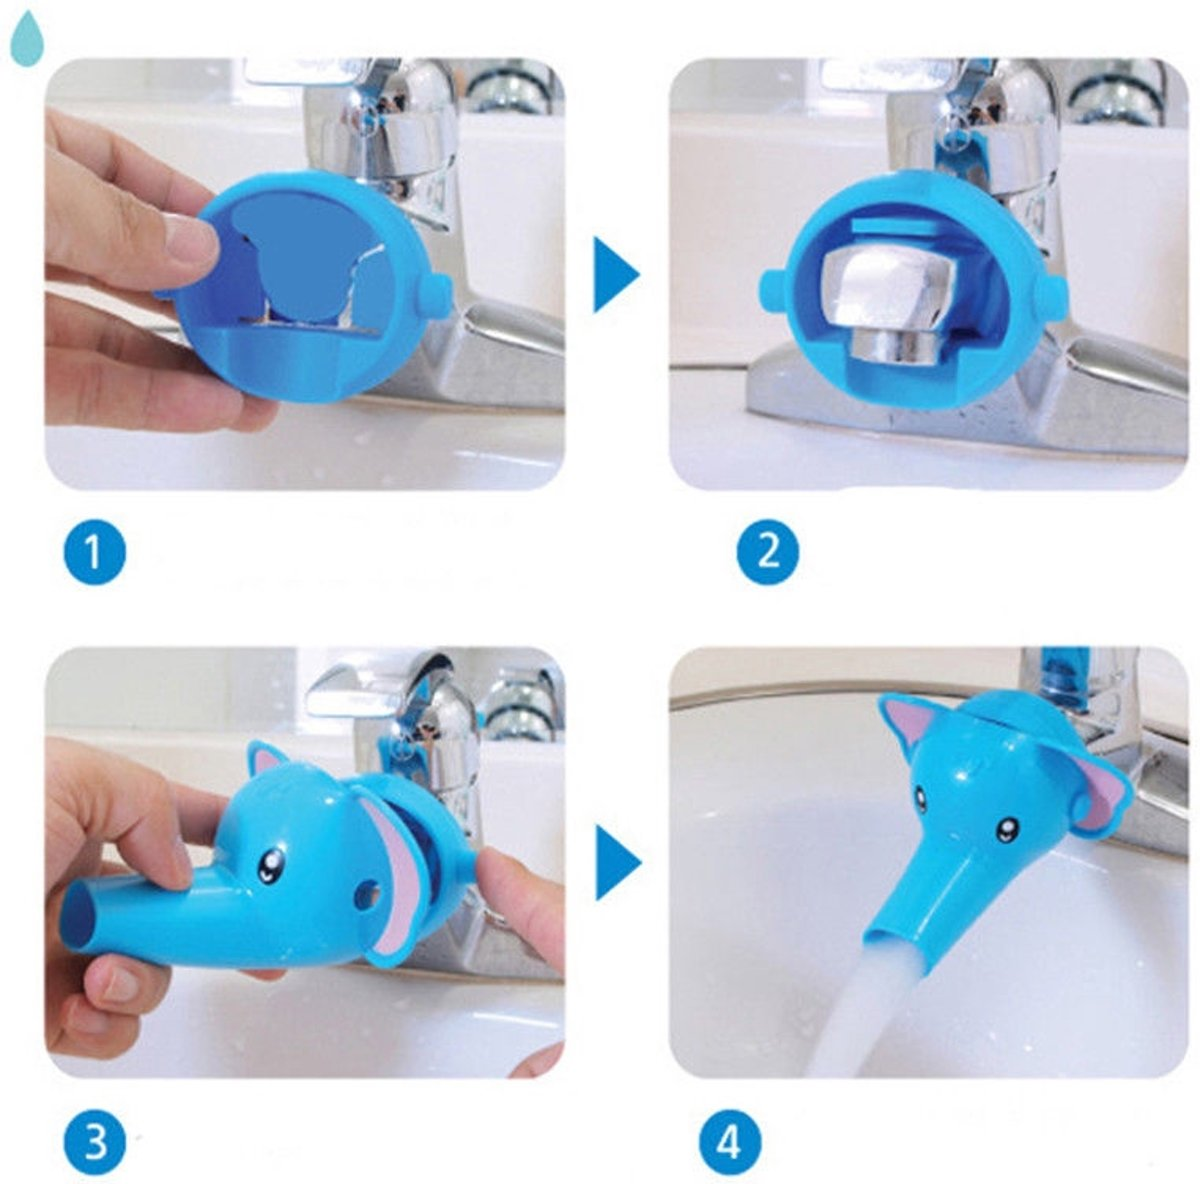 Aiueo Icefield Water Proof Dry Bags Packing Organizers 15l Biru Source · 9200000055656344 jpg